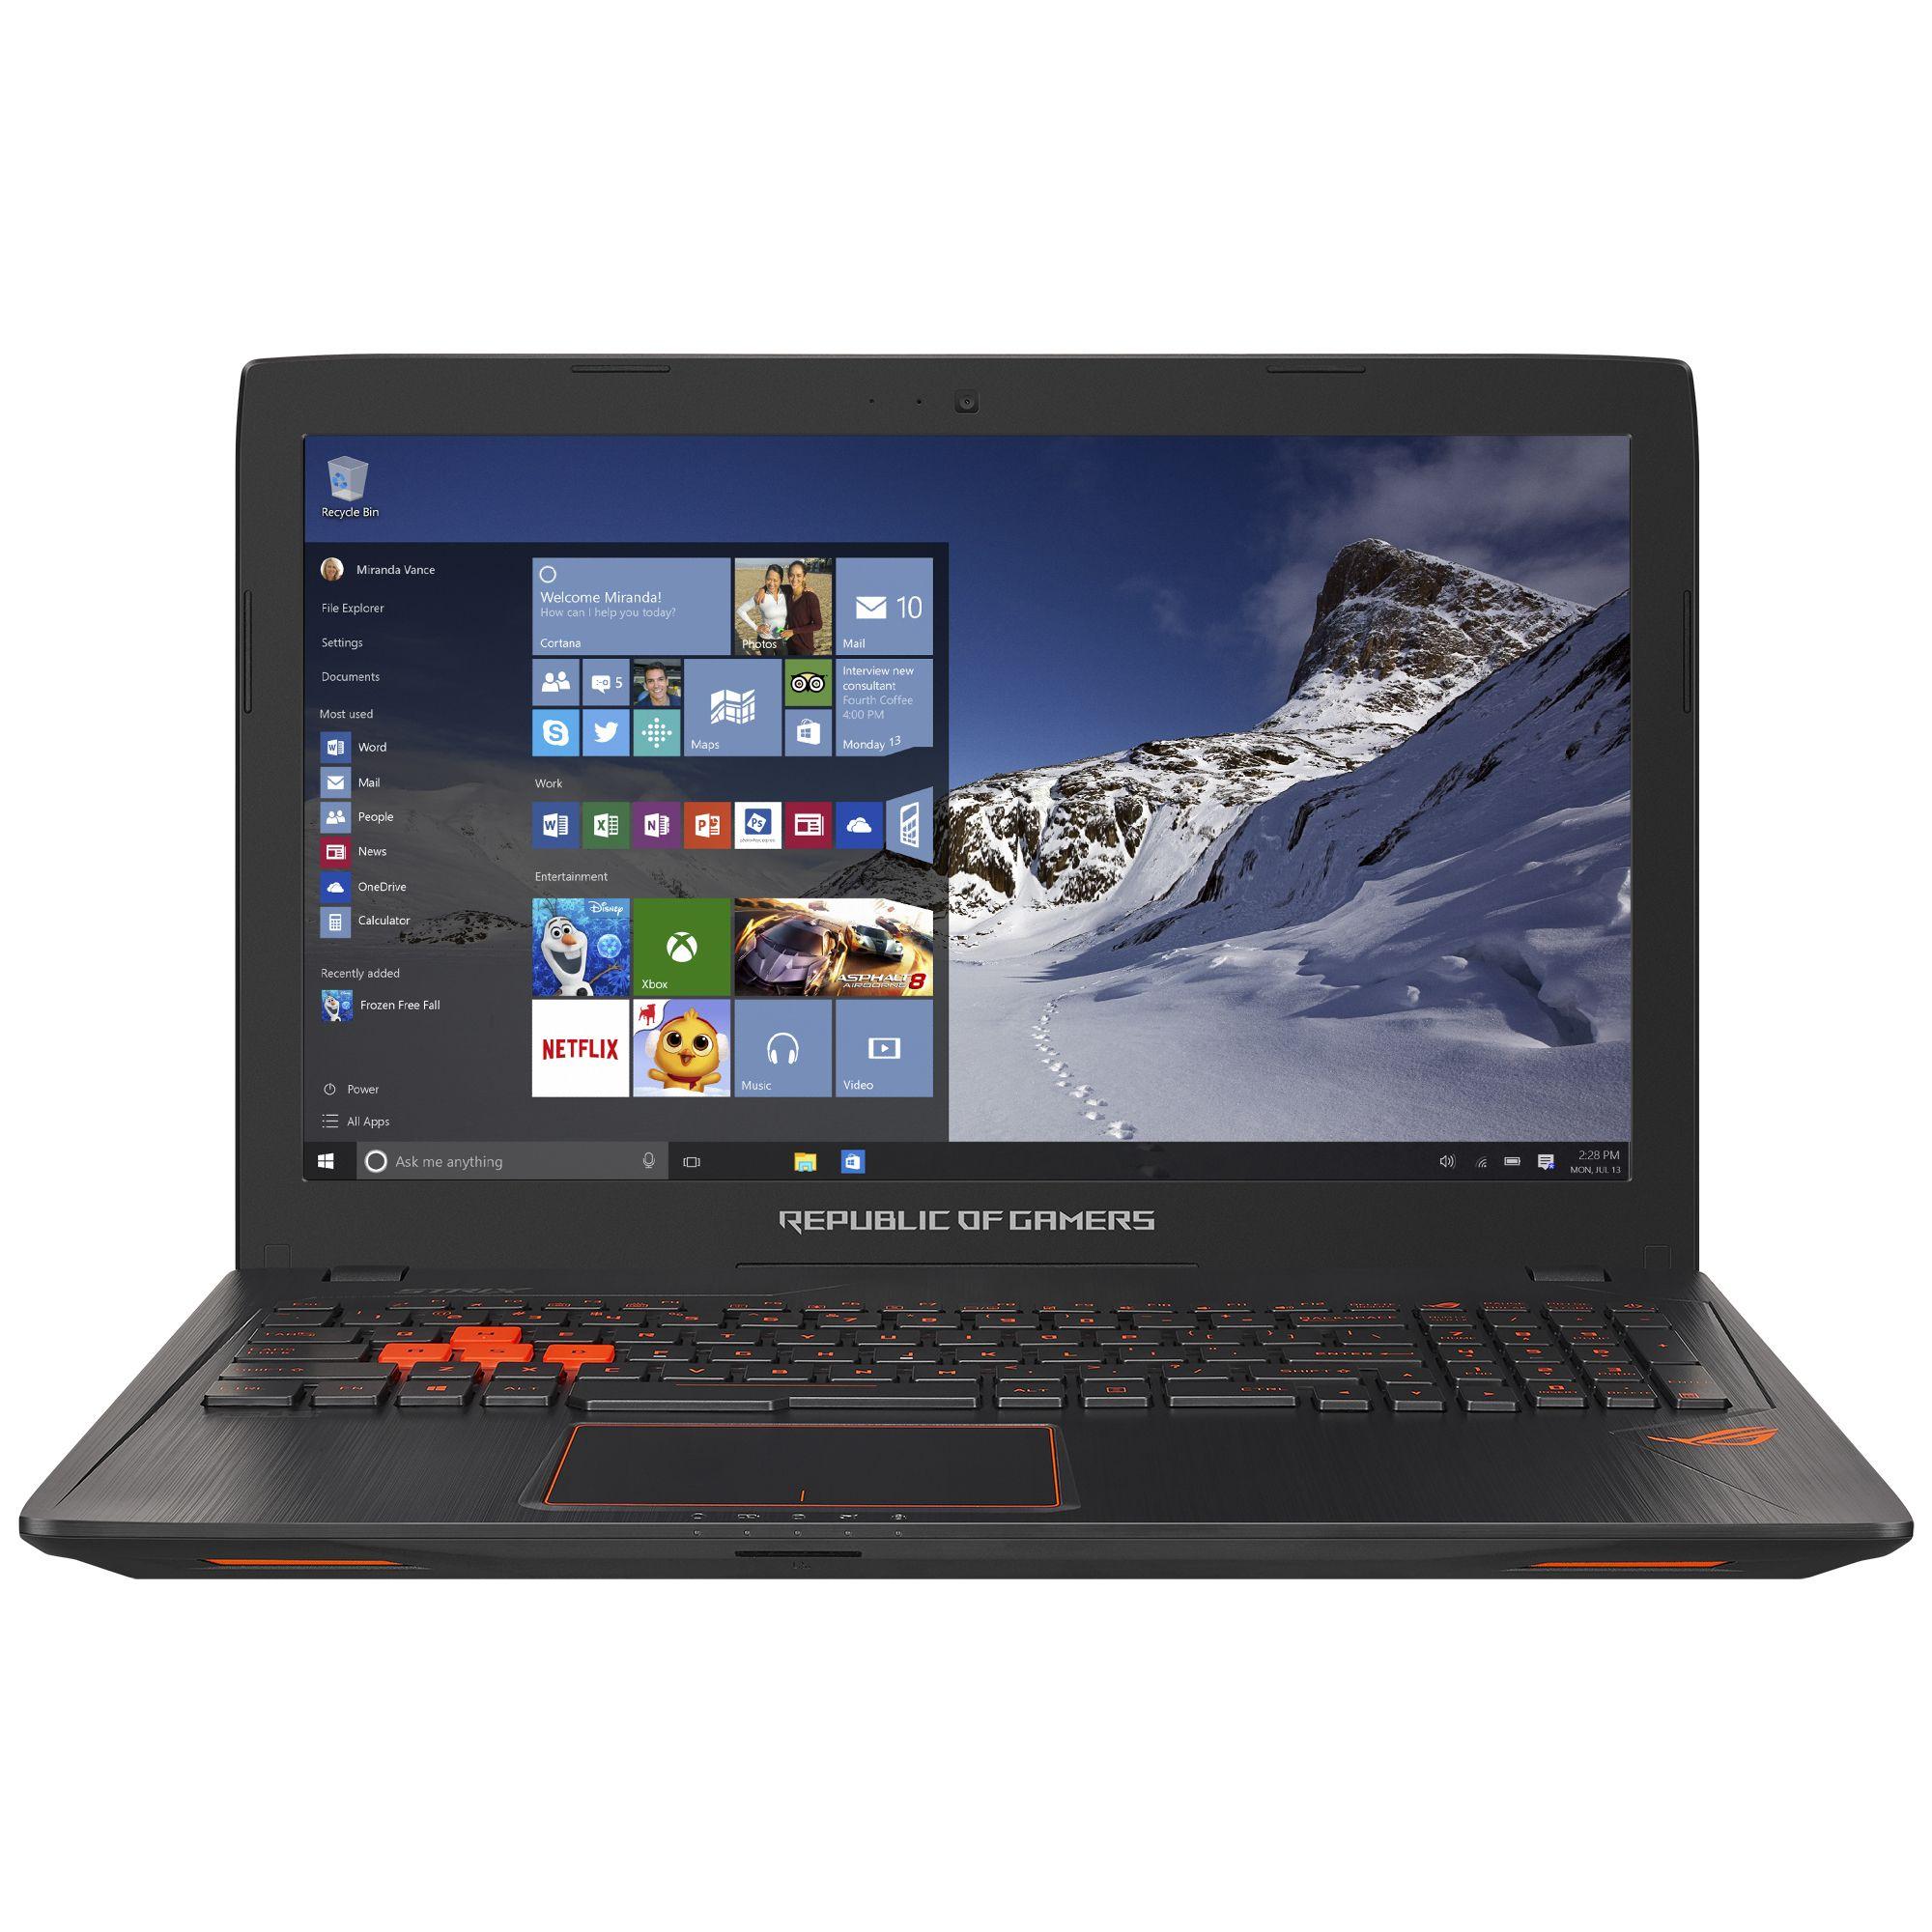 Notebook Asus ROG GL553VE 15.6 Full HD Intel Core i7-7700HQ GTX 1050 Ti-4GB RAM 16GB HDD 1TB Endless OS